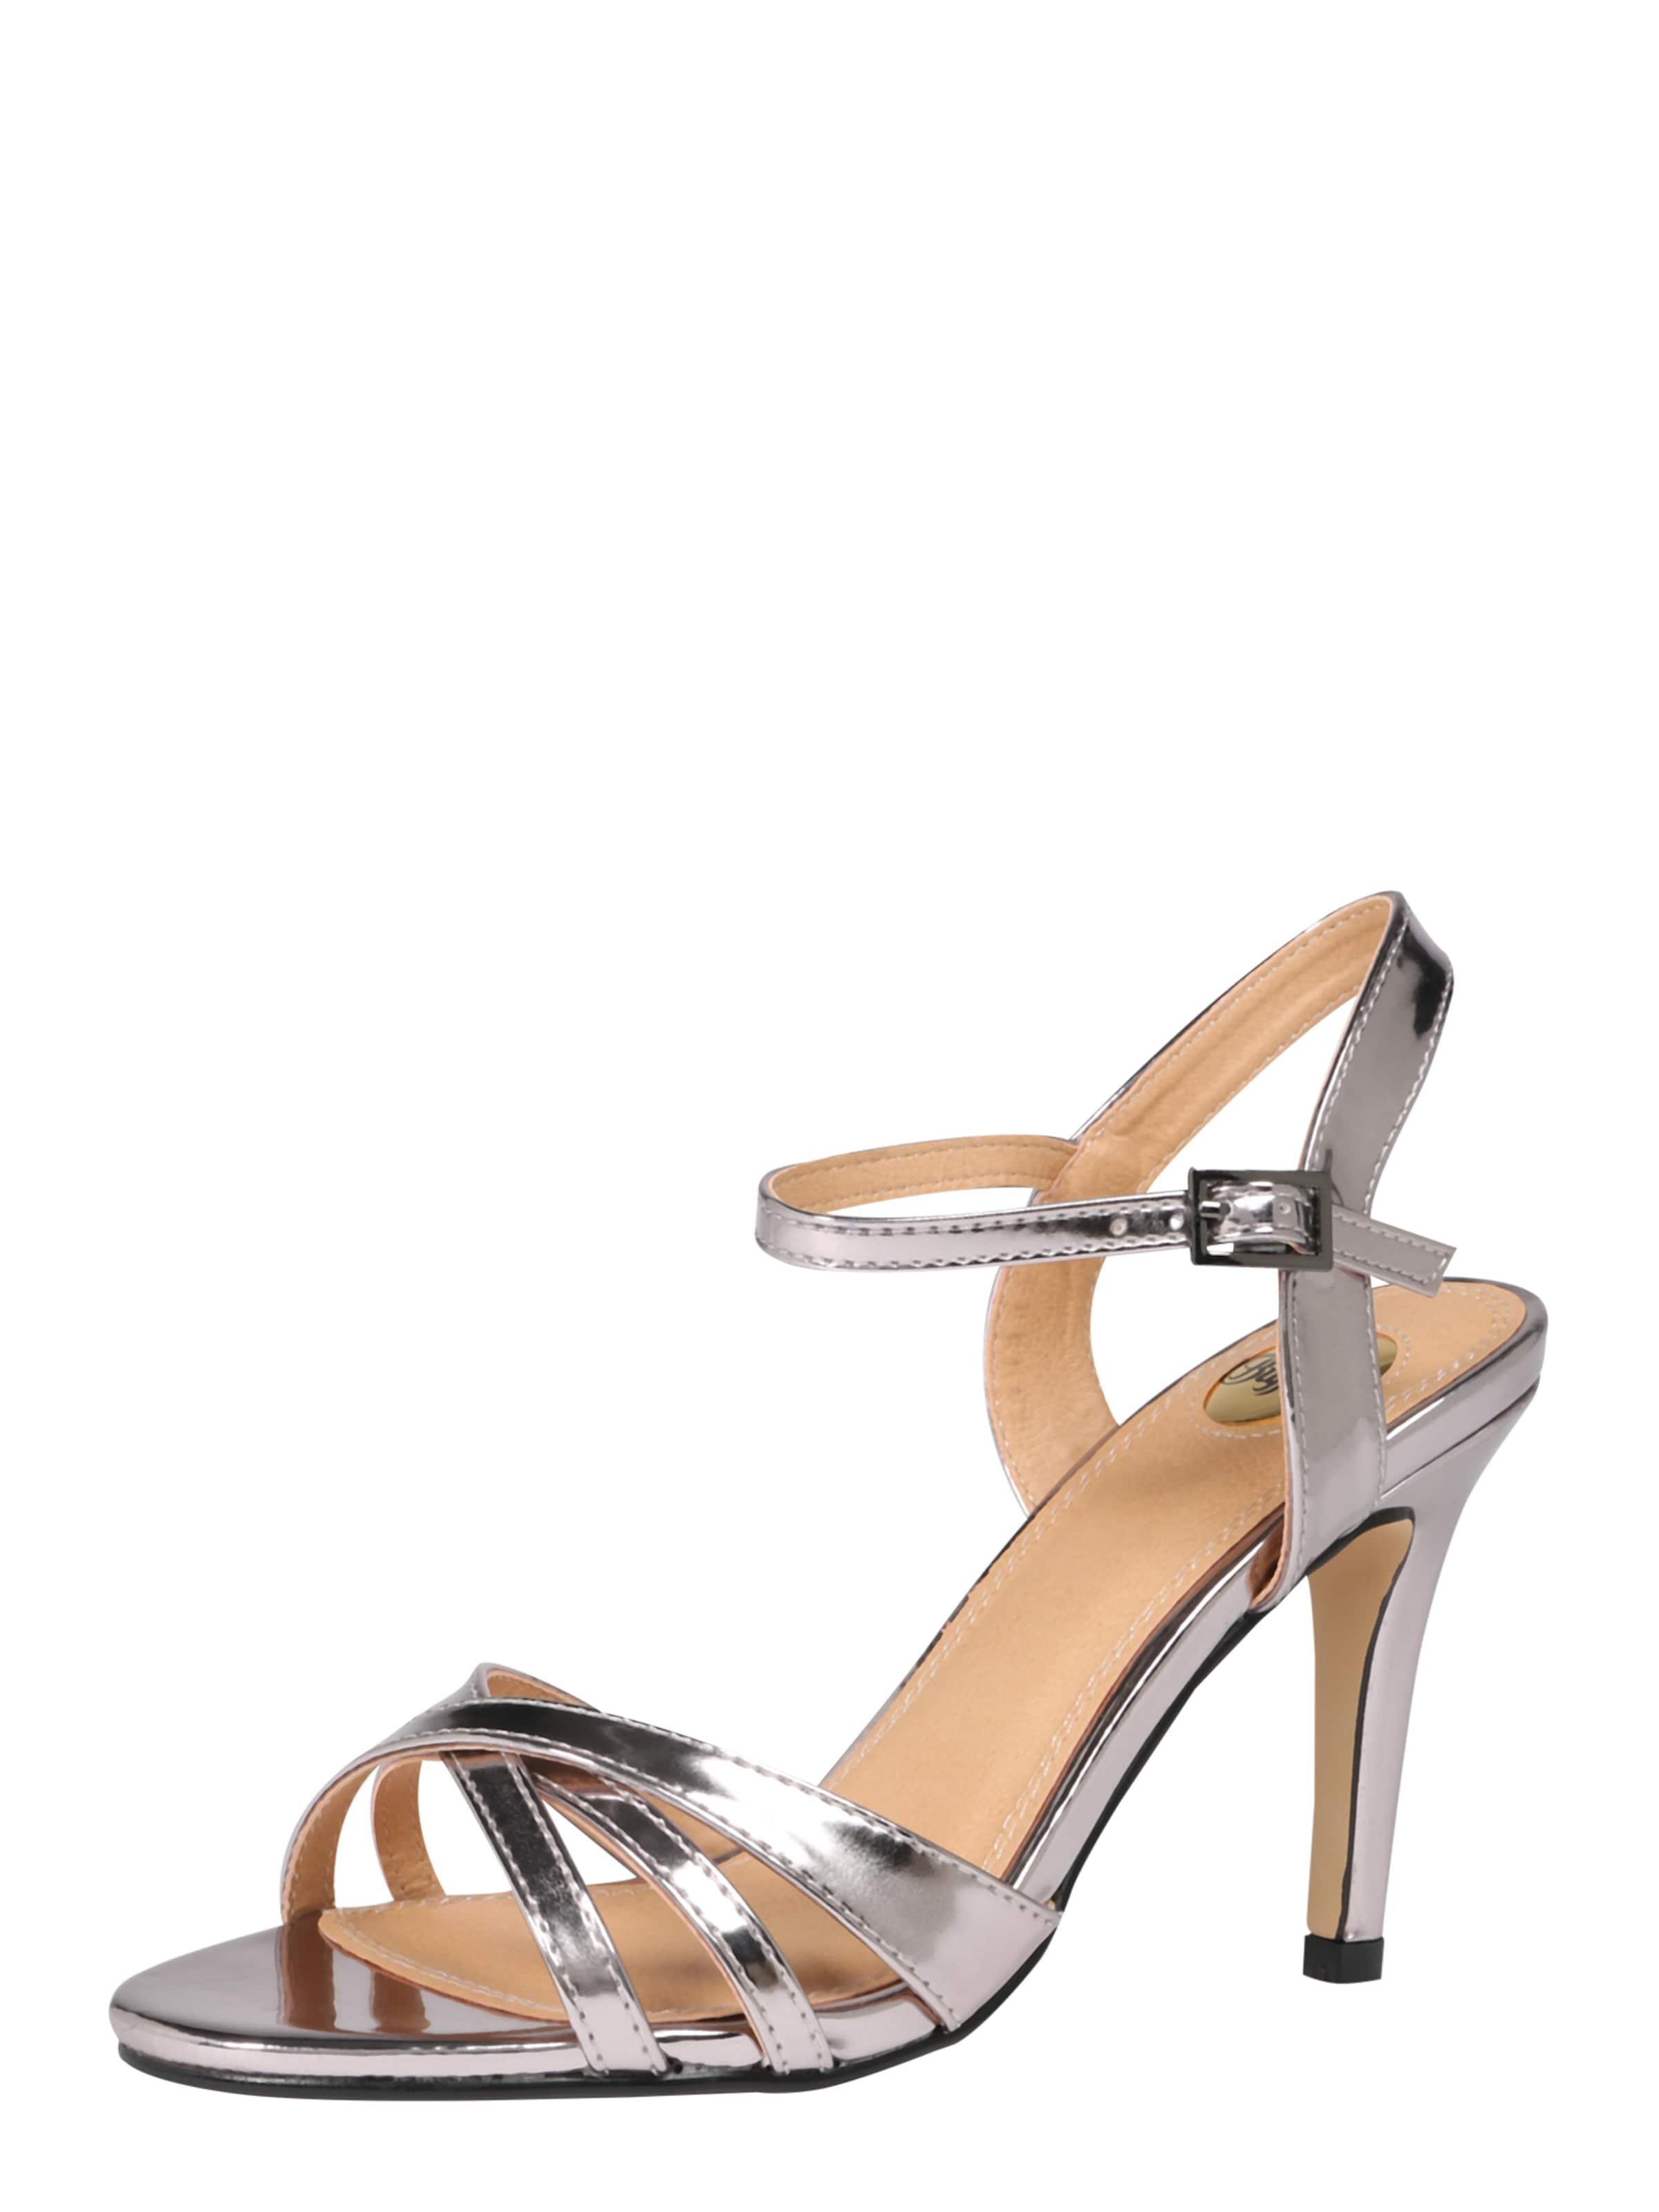 BUFFALO High Heel-Sandalette Verschleißfeste billige Schuhe